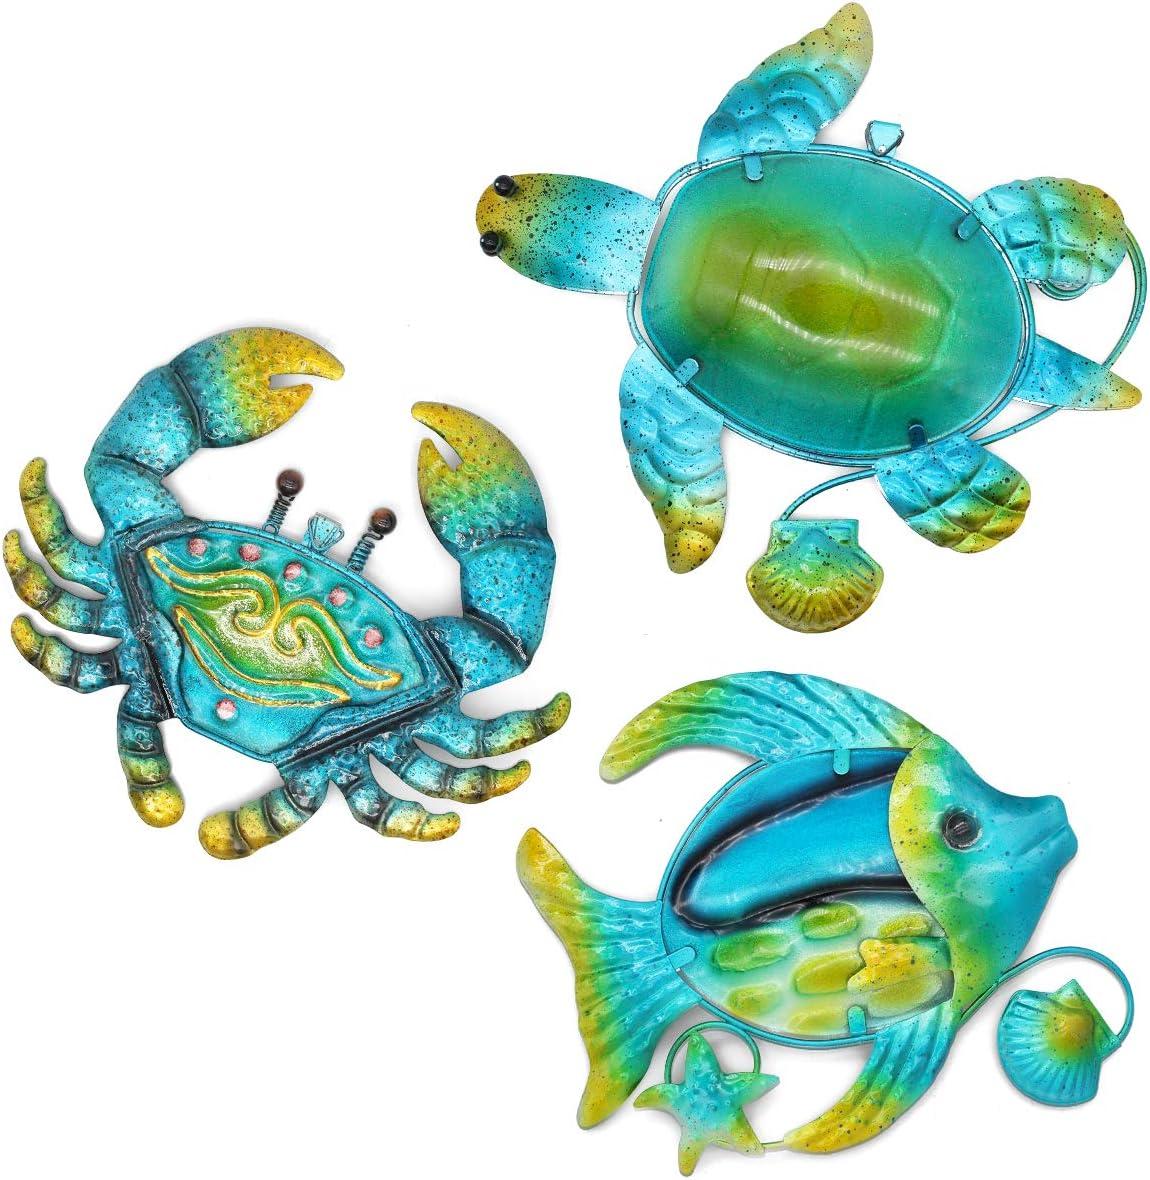 FANWNKI 3Pack Metal Crab Sea Turtle Fish Mediterranean Wall Art Decor for Pool Porch Fence Garden Home Livingroom Bedroom,Blue